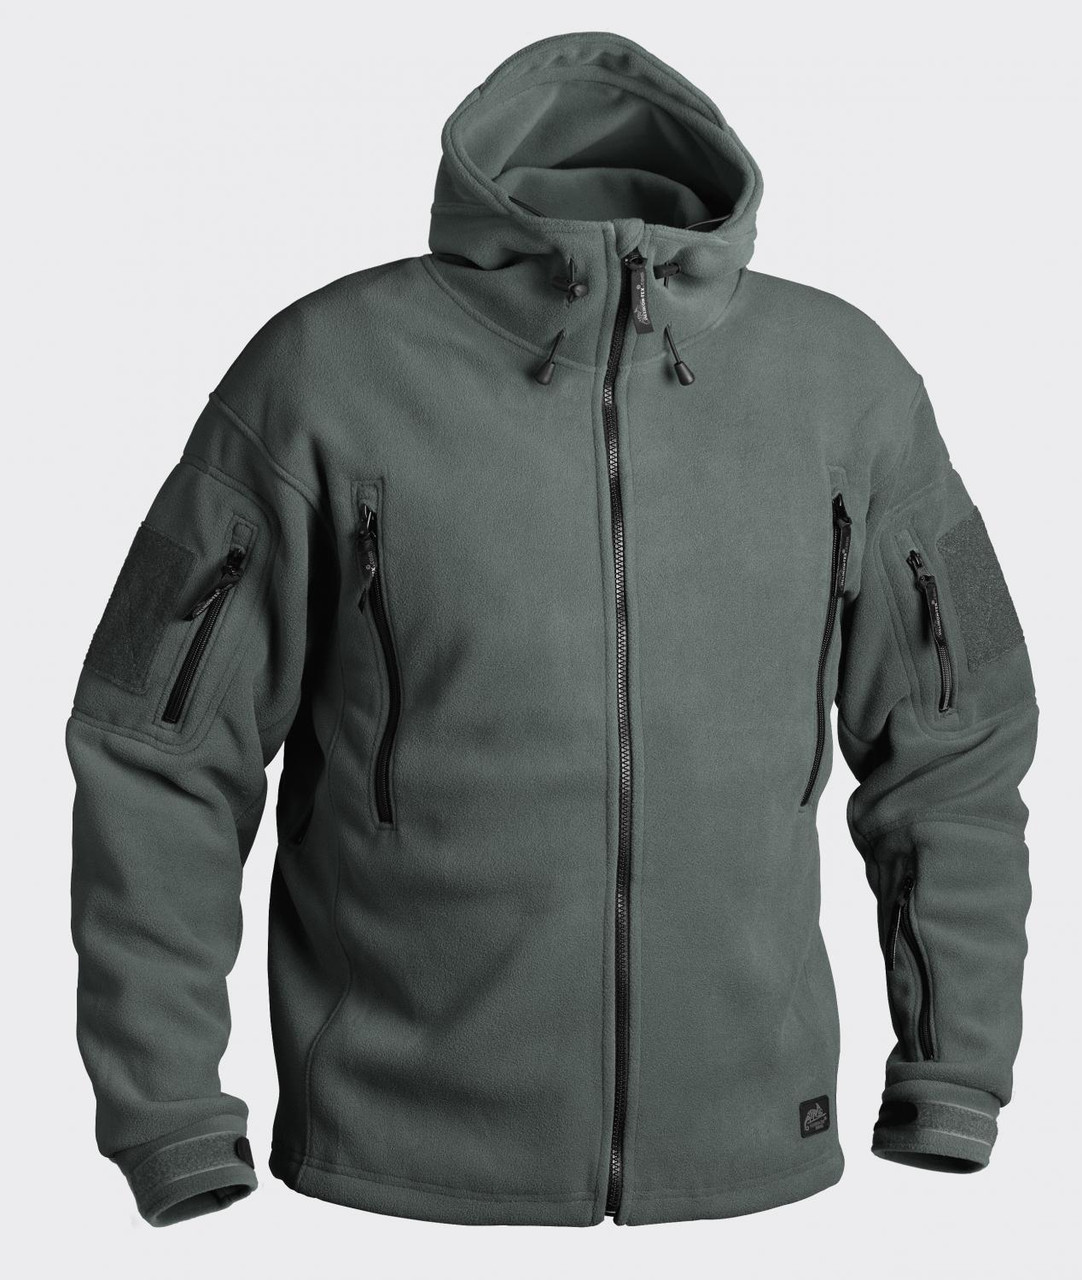 Куртка флисовая Helikon-Tex® Patriot - Foliage Green